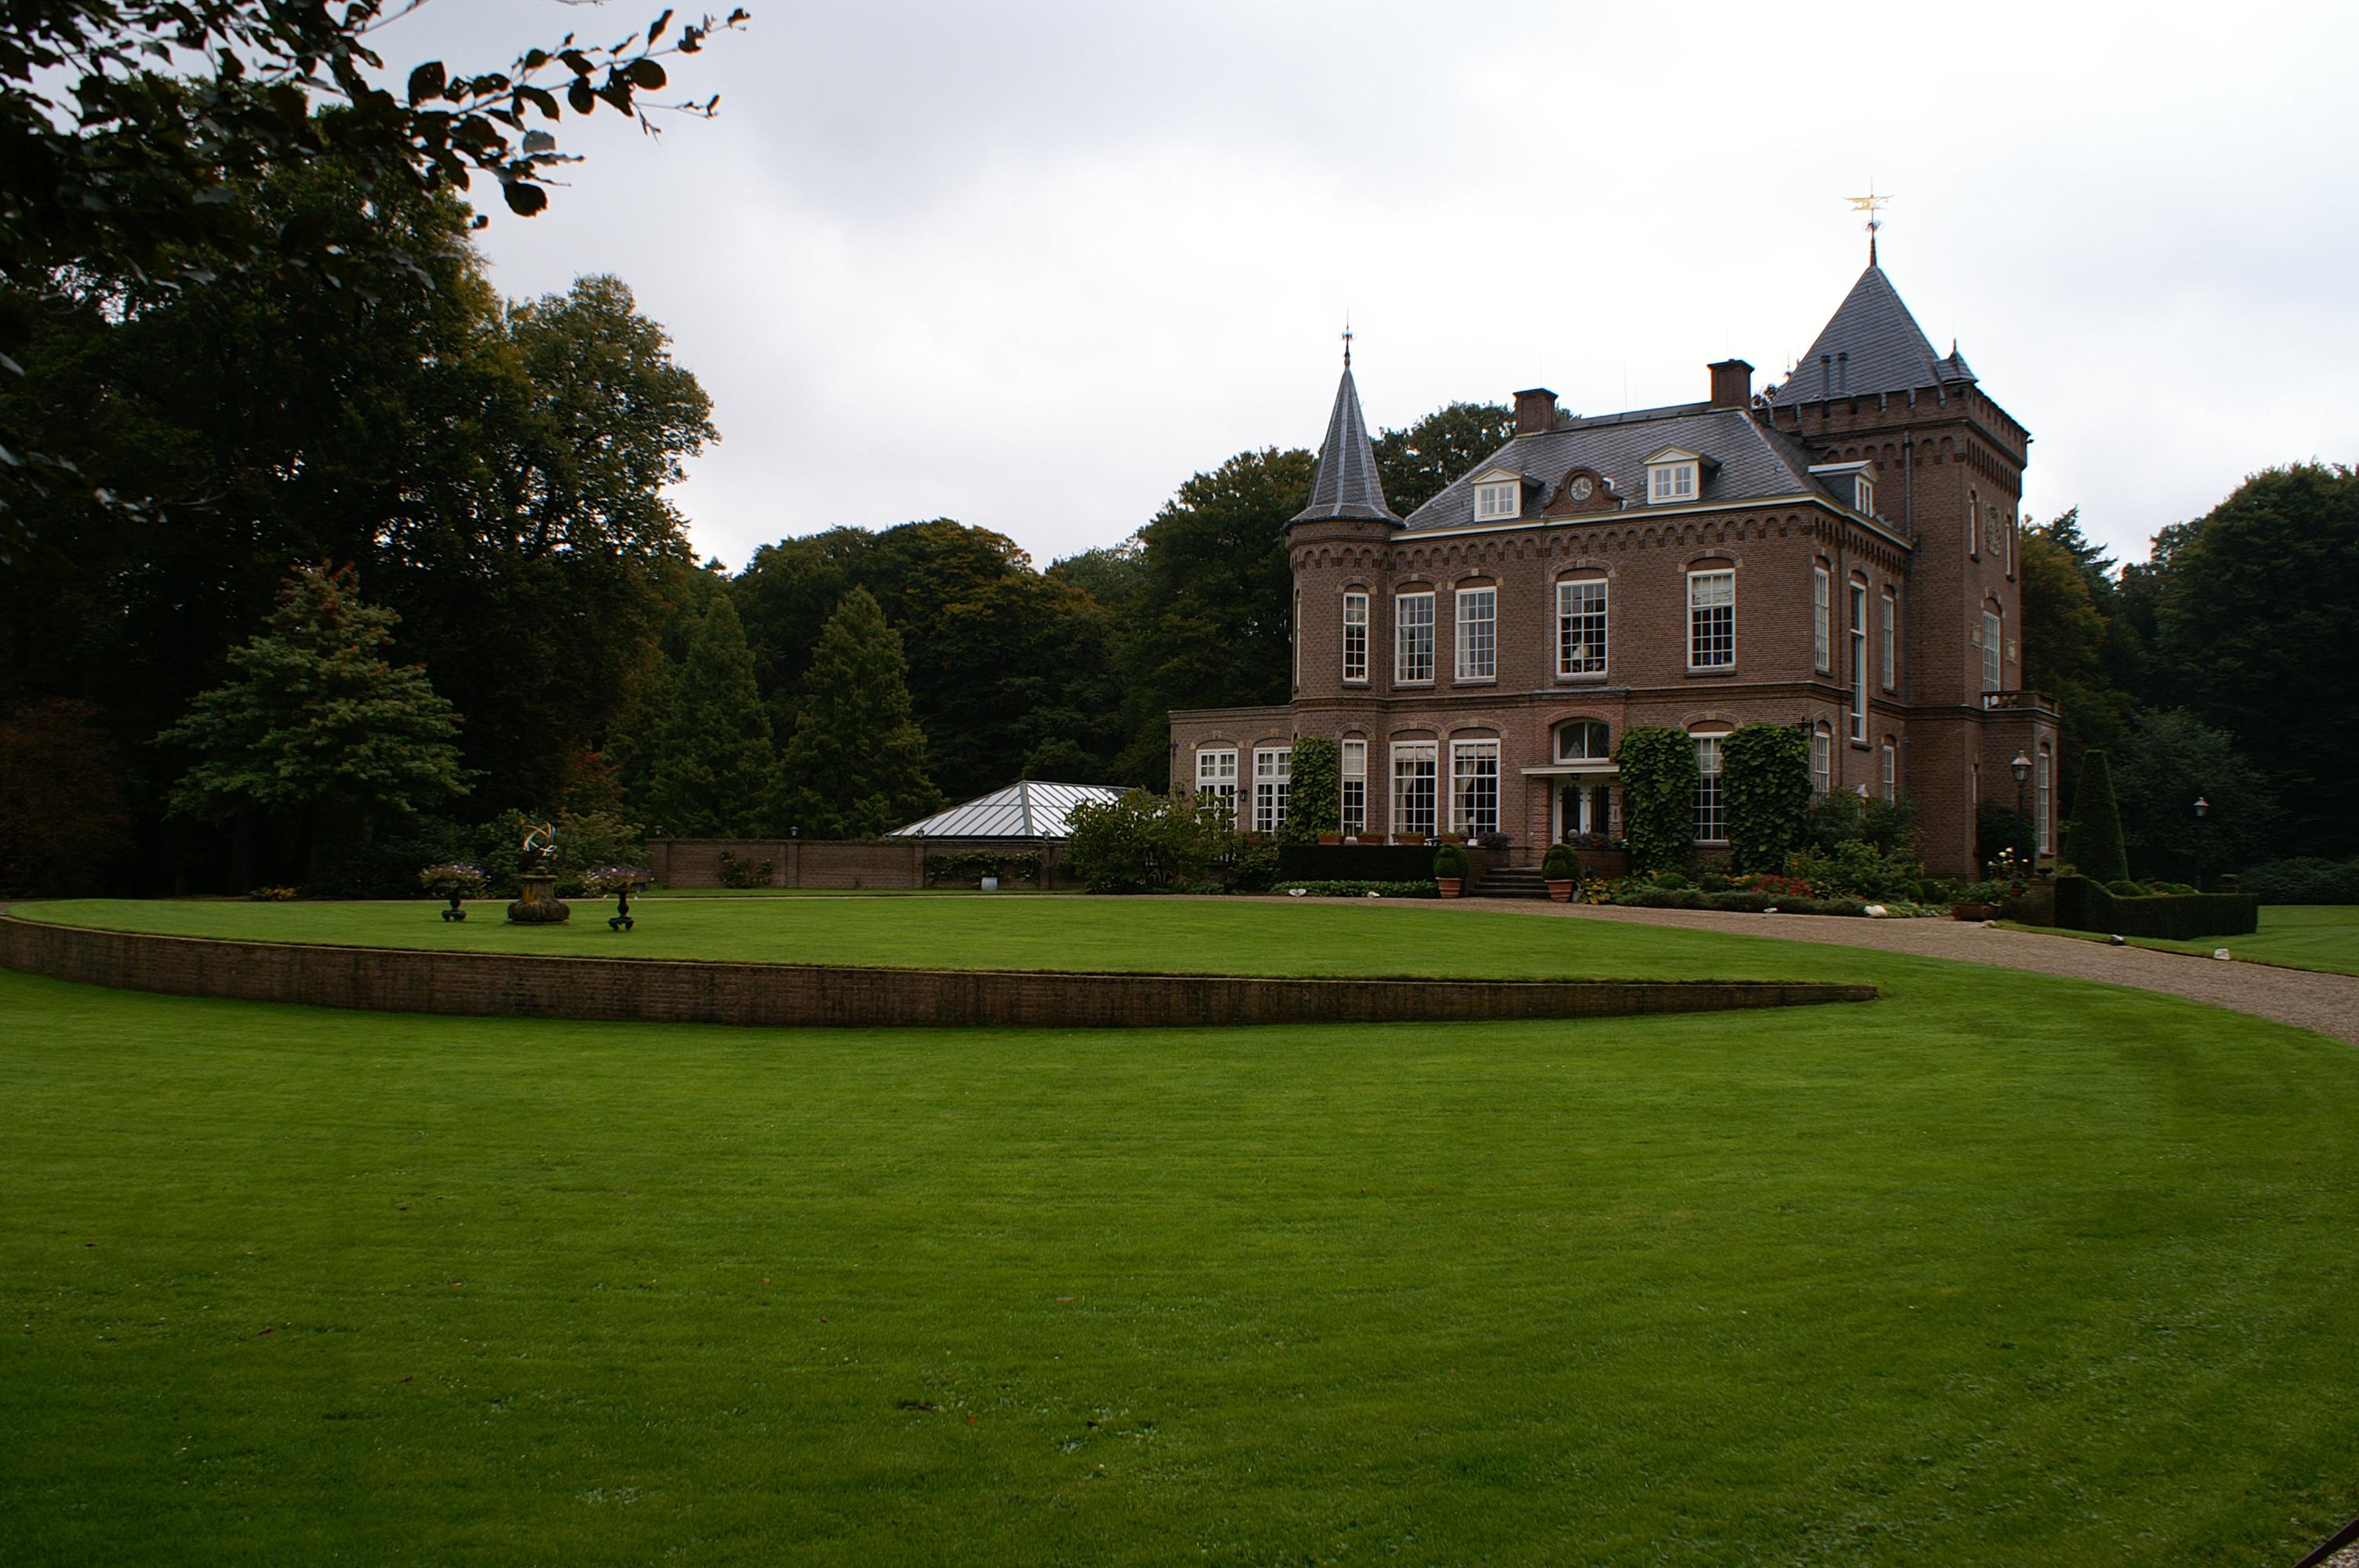 dating nl Veenendaal